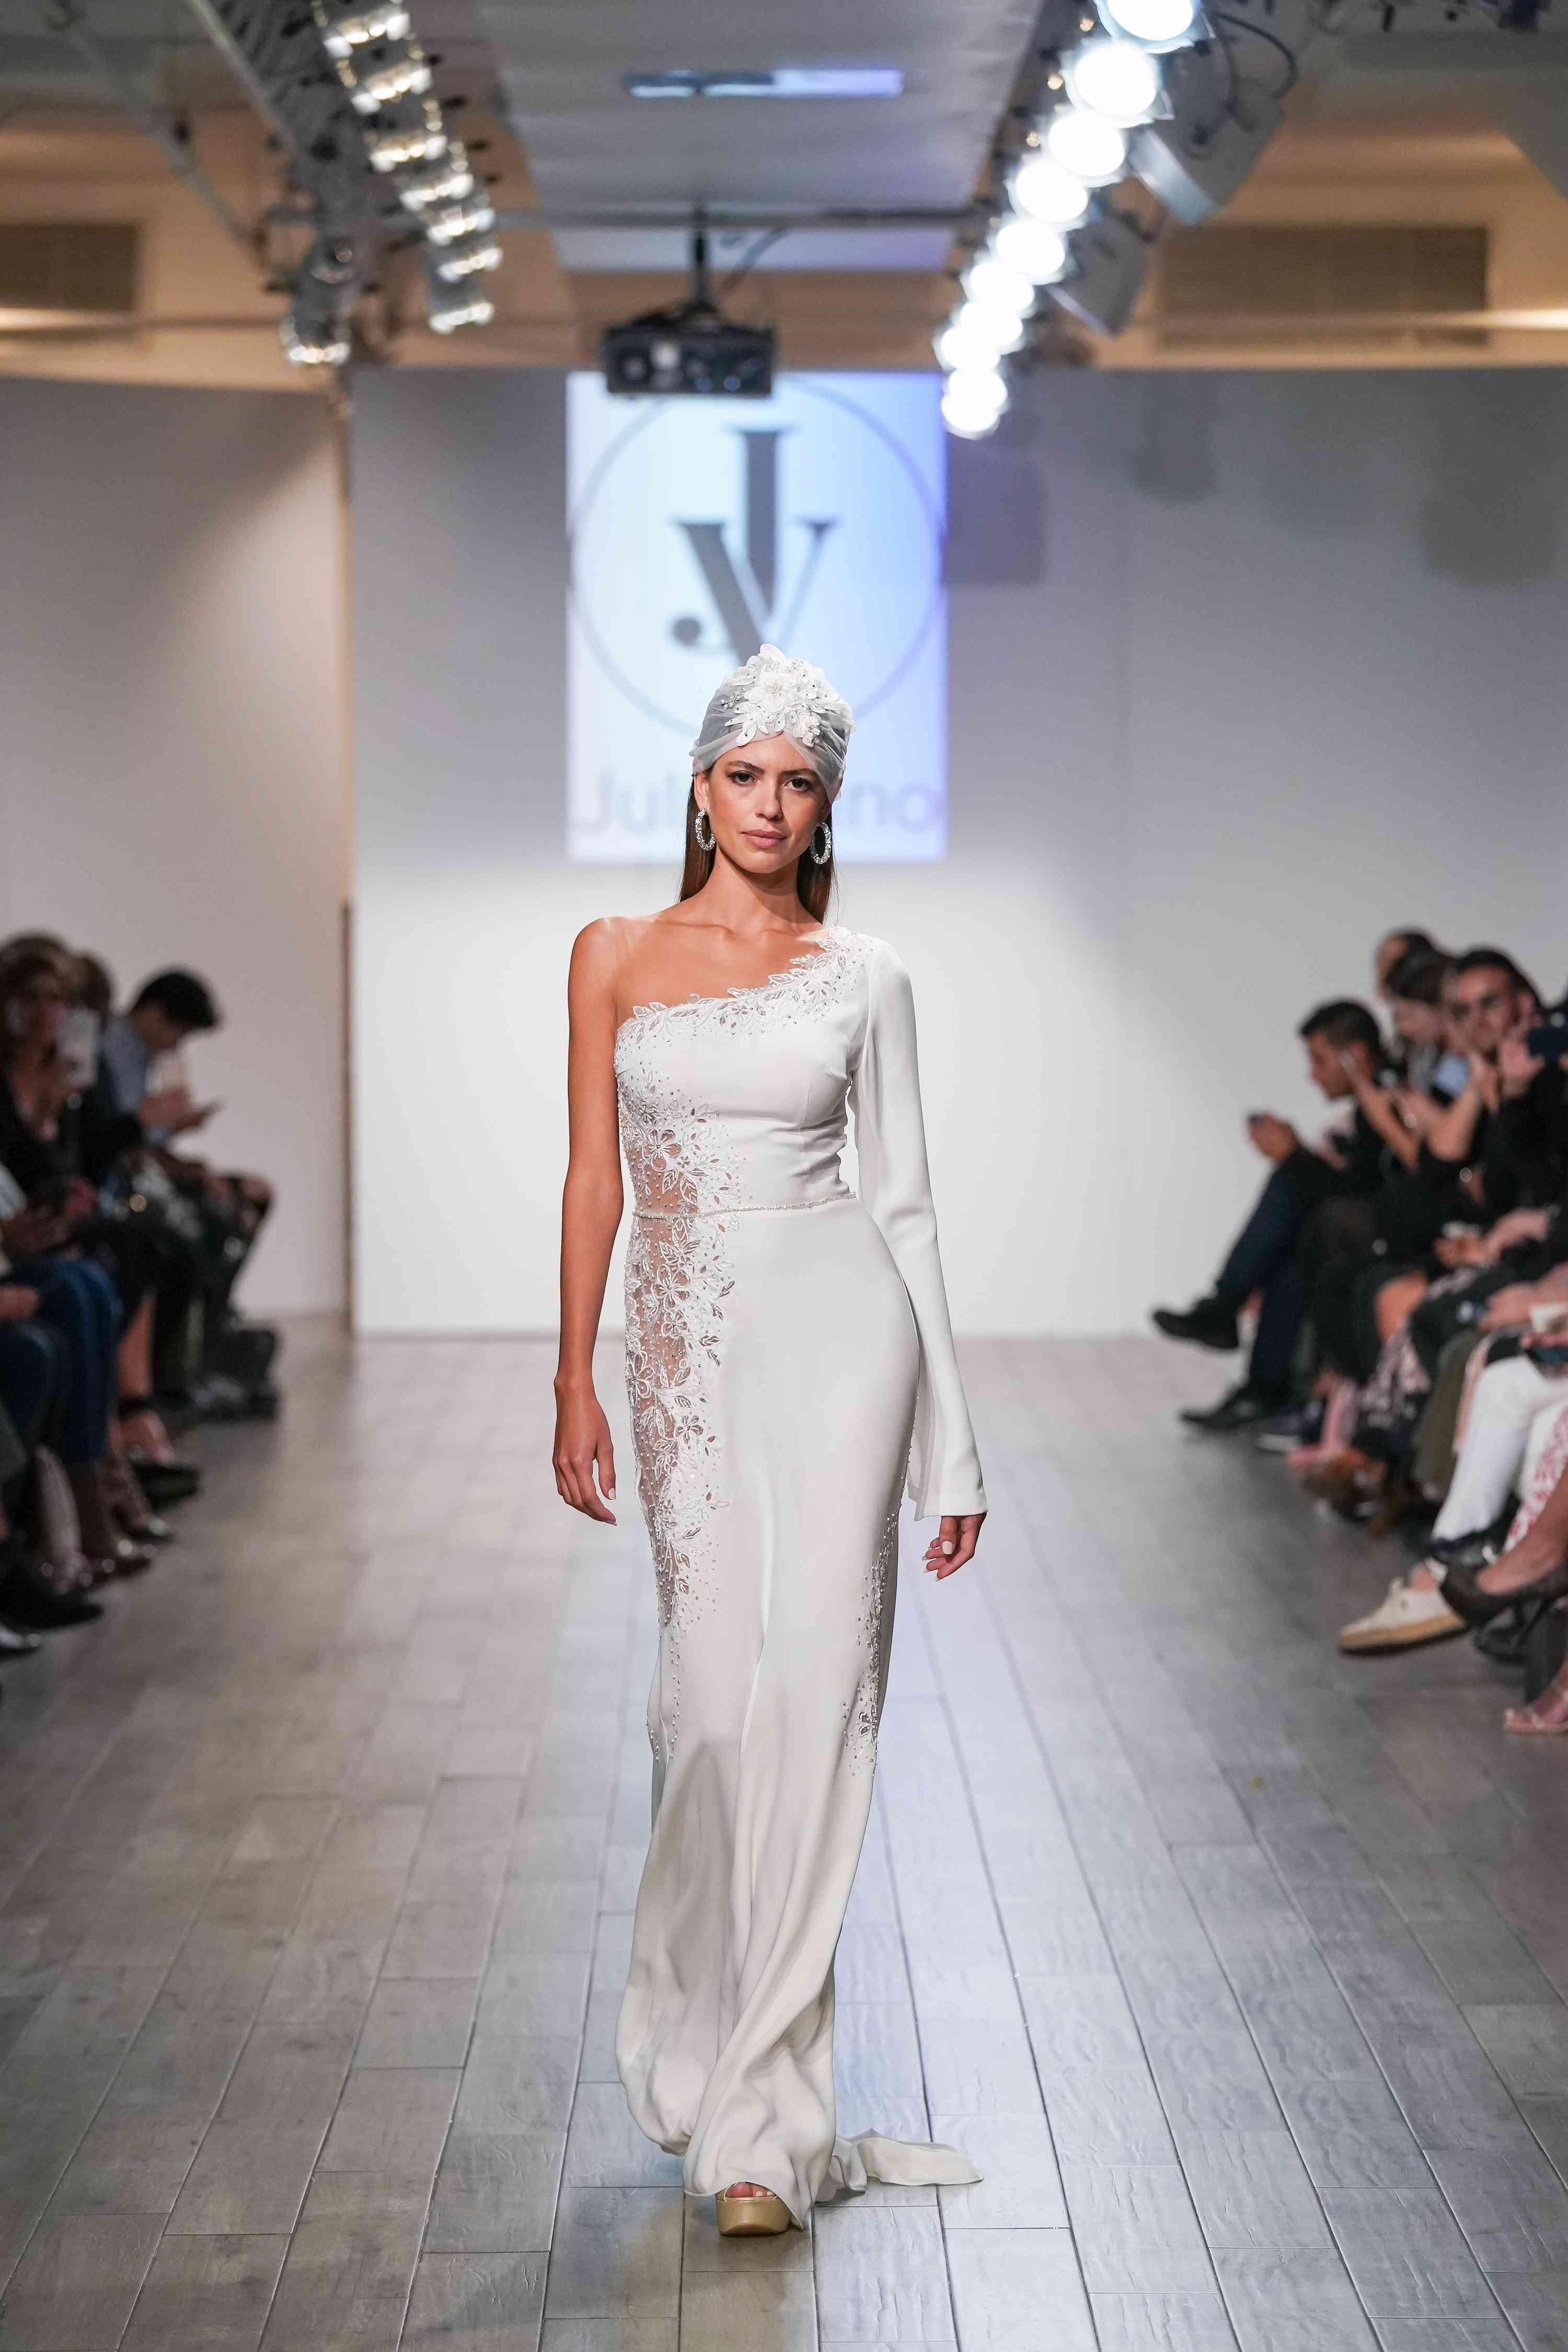 Model in one-shoulder long sleeve wedding dress